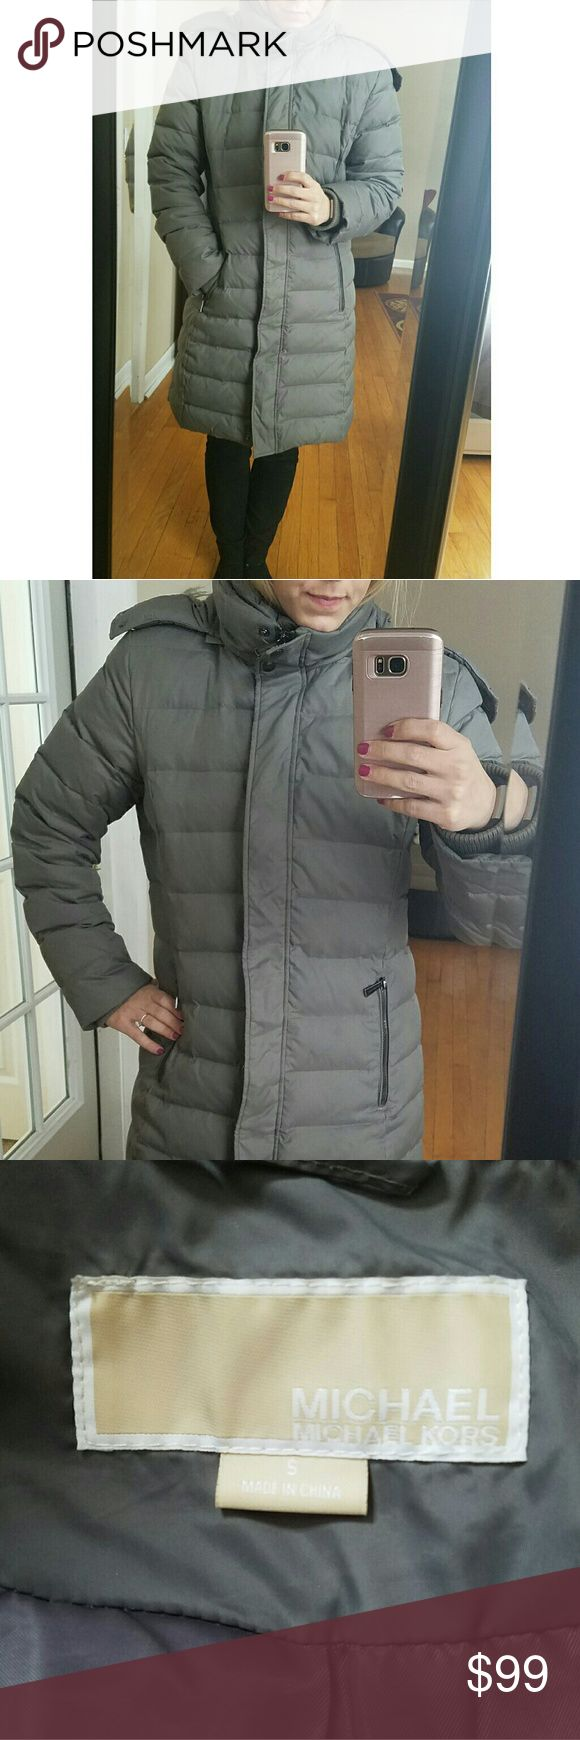 MICHAEL KORS puffer coat! Size small Michael kors down coat puffer jacket. Removable fur hood. Originally purchased from Macy's. GUC. MICHAEL Michael Kors Jackets & Coats Puffers